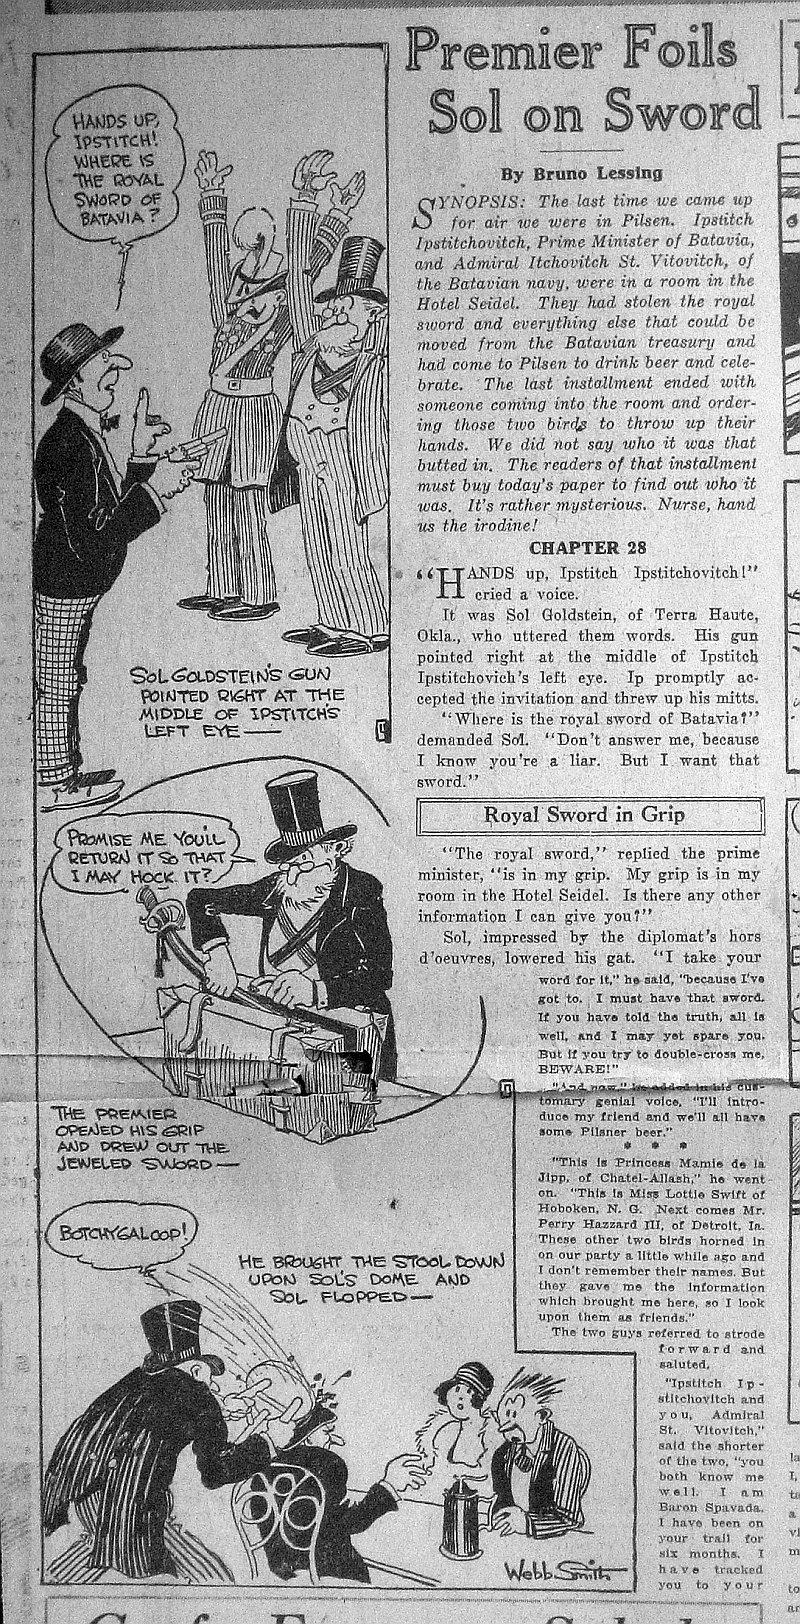 webb-smith-8-21-1927.jpg